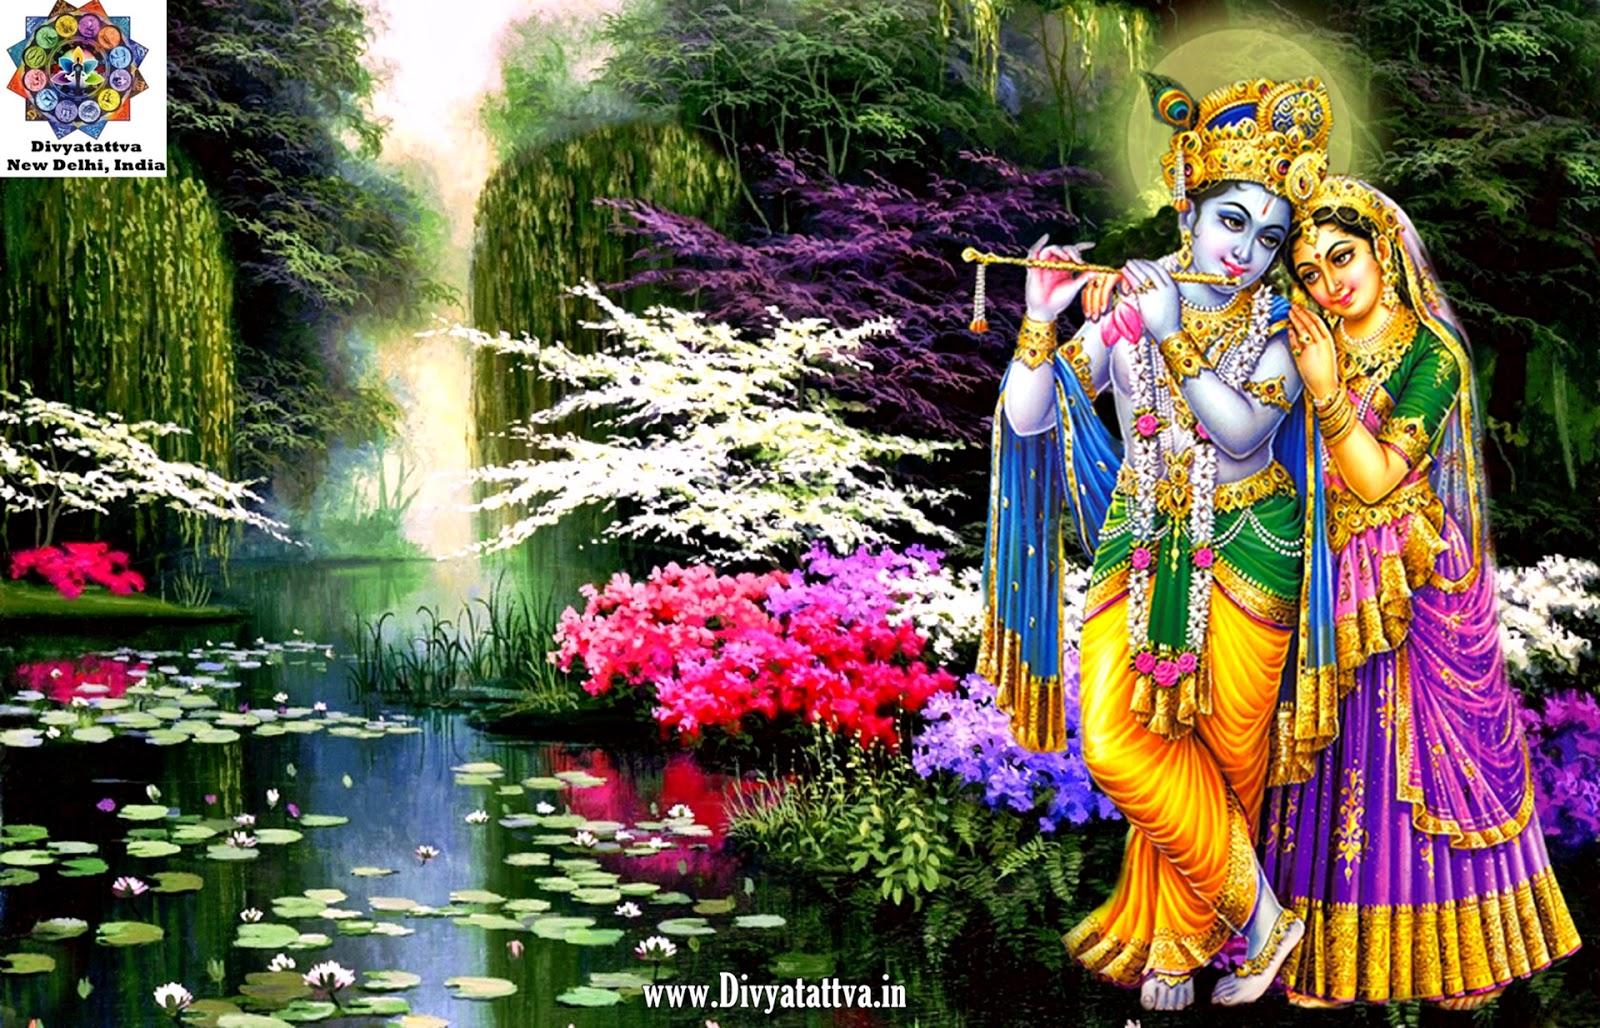 radha krishna full size love enchantment scenery creative lotus enchanted attractions trees beautiful nature colors wallpaper flower 4k www.divyatattva.in